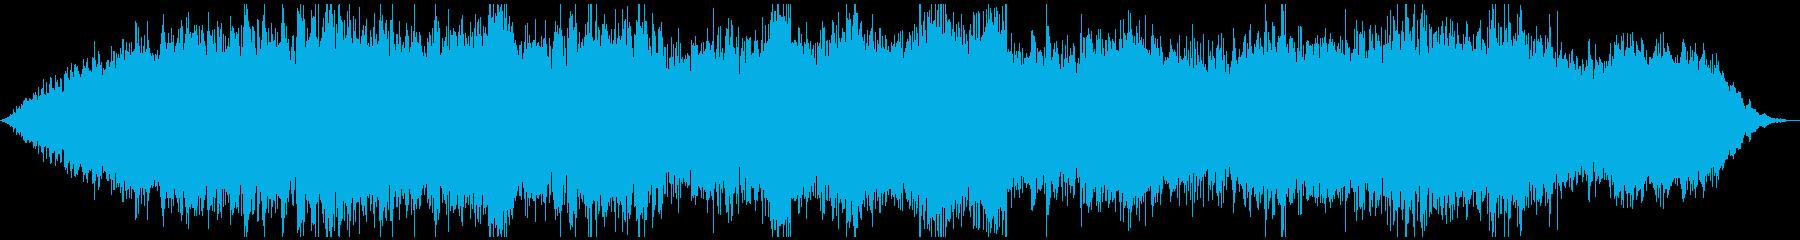 PADS ホラーストリングス01の再生済みの波形